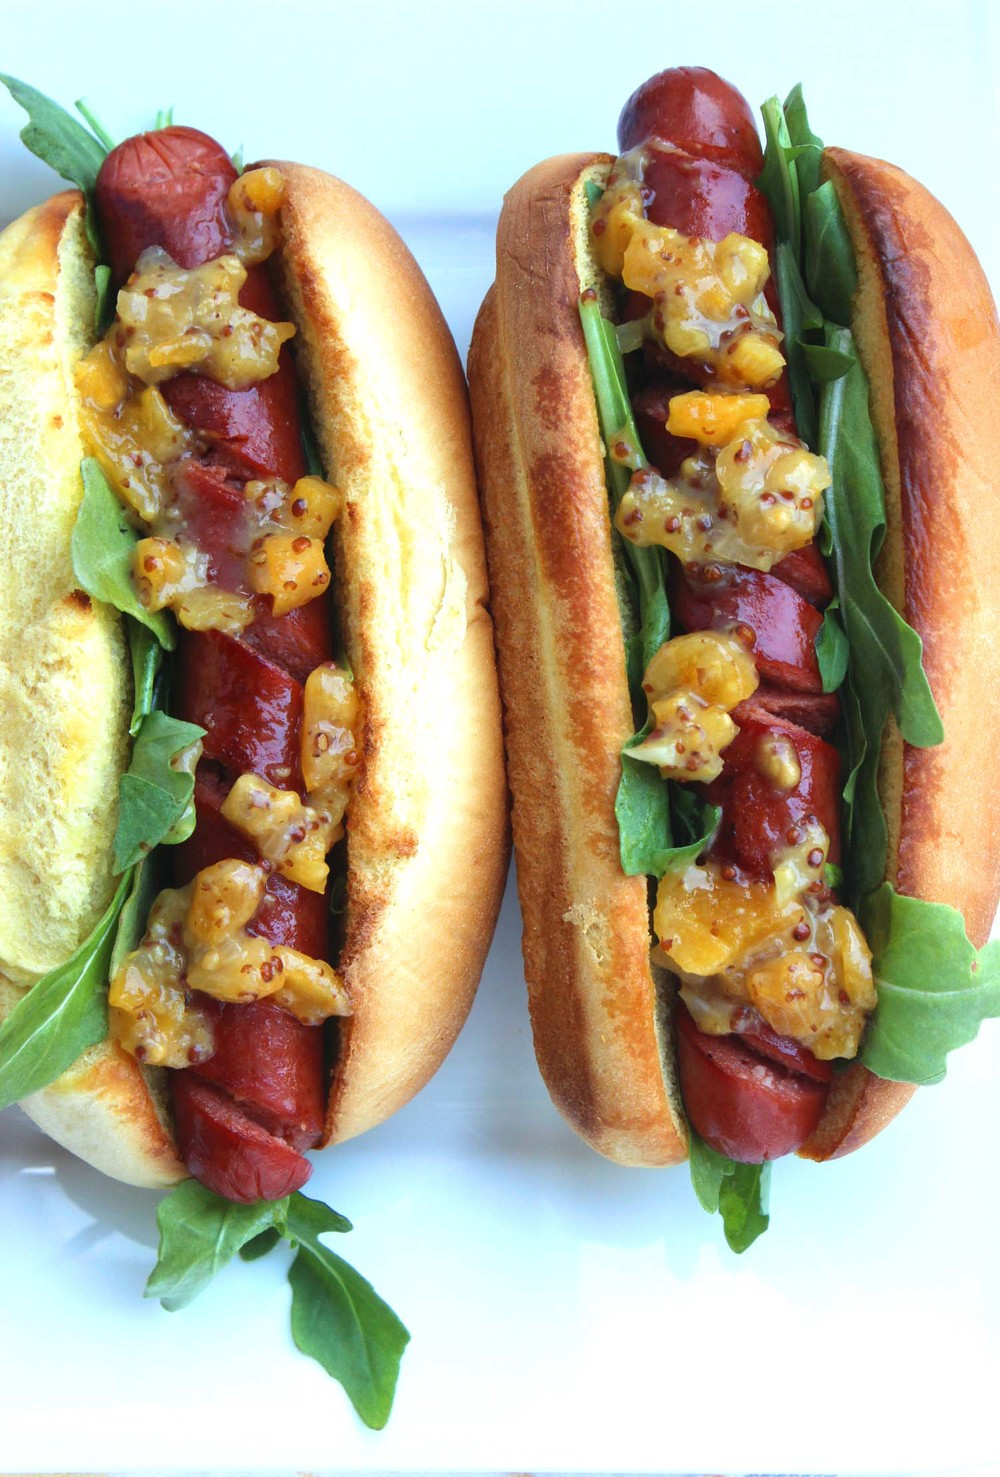 Apricot Mostarda & Spiralized Hotdogs| Image:Laura Messersmith